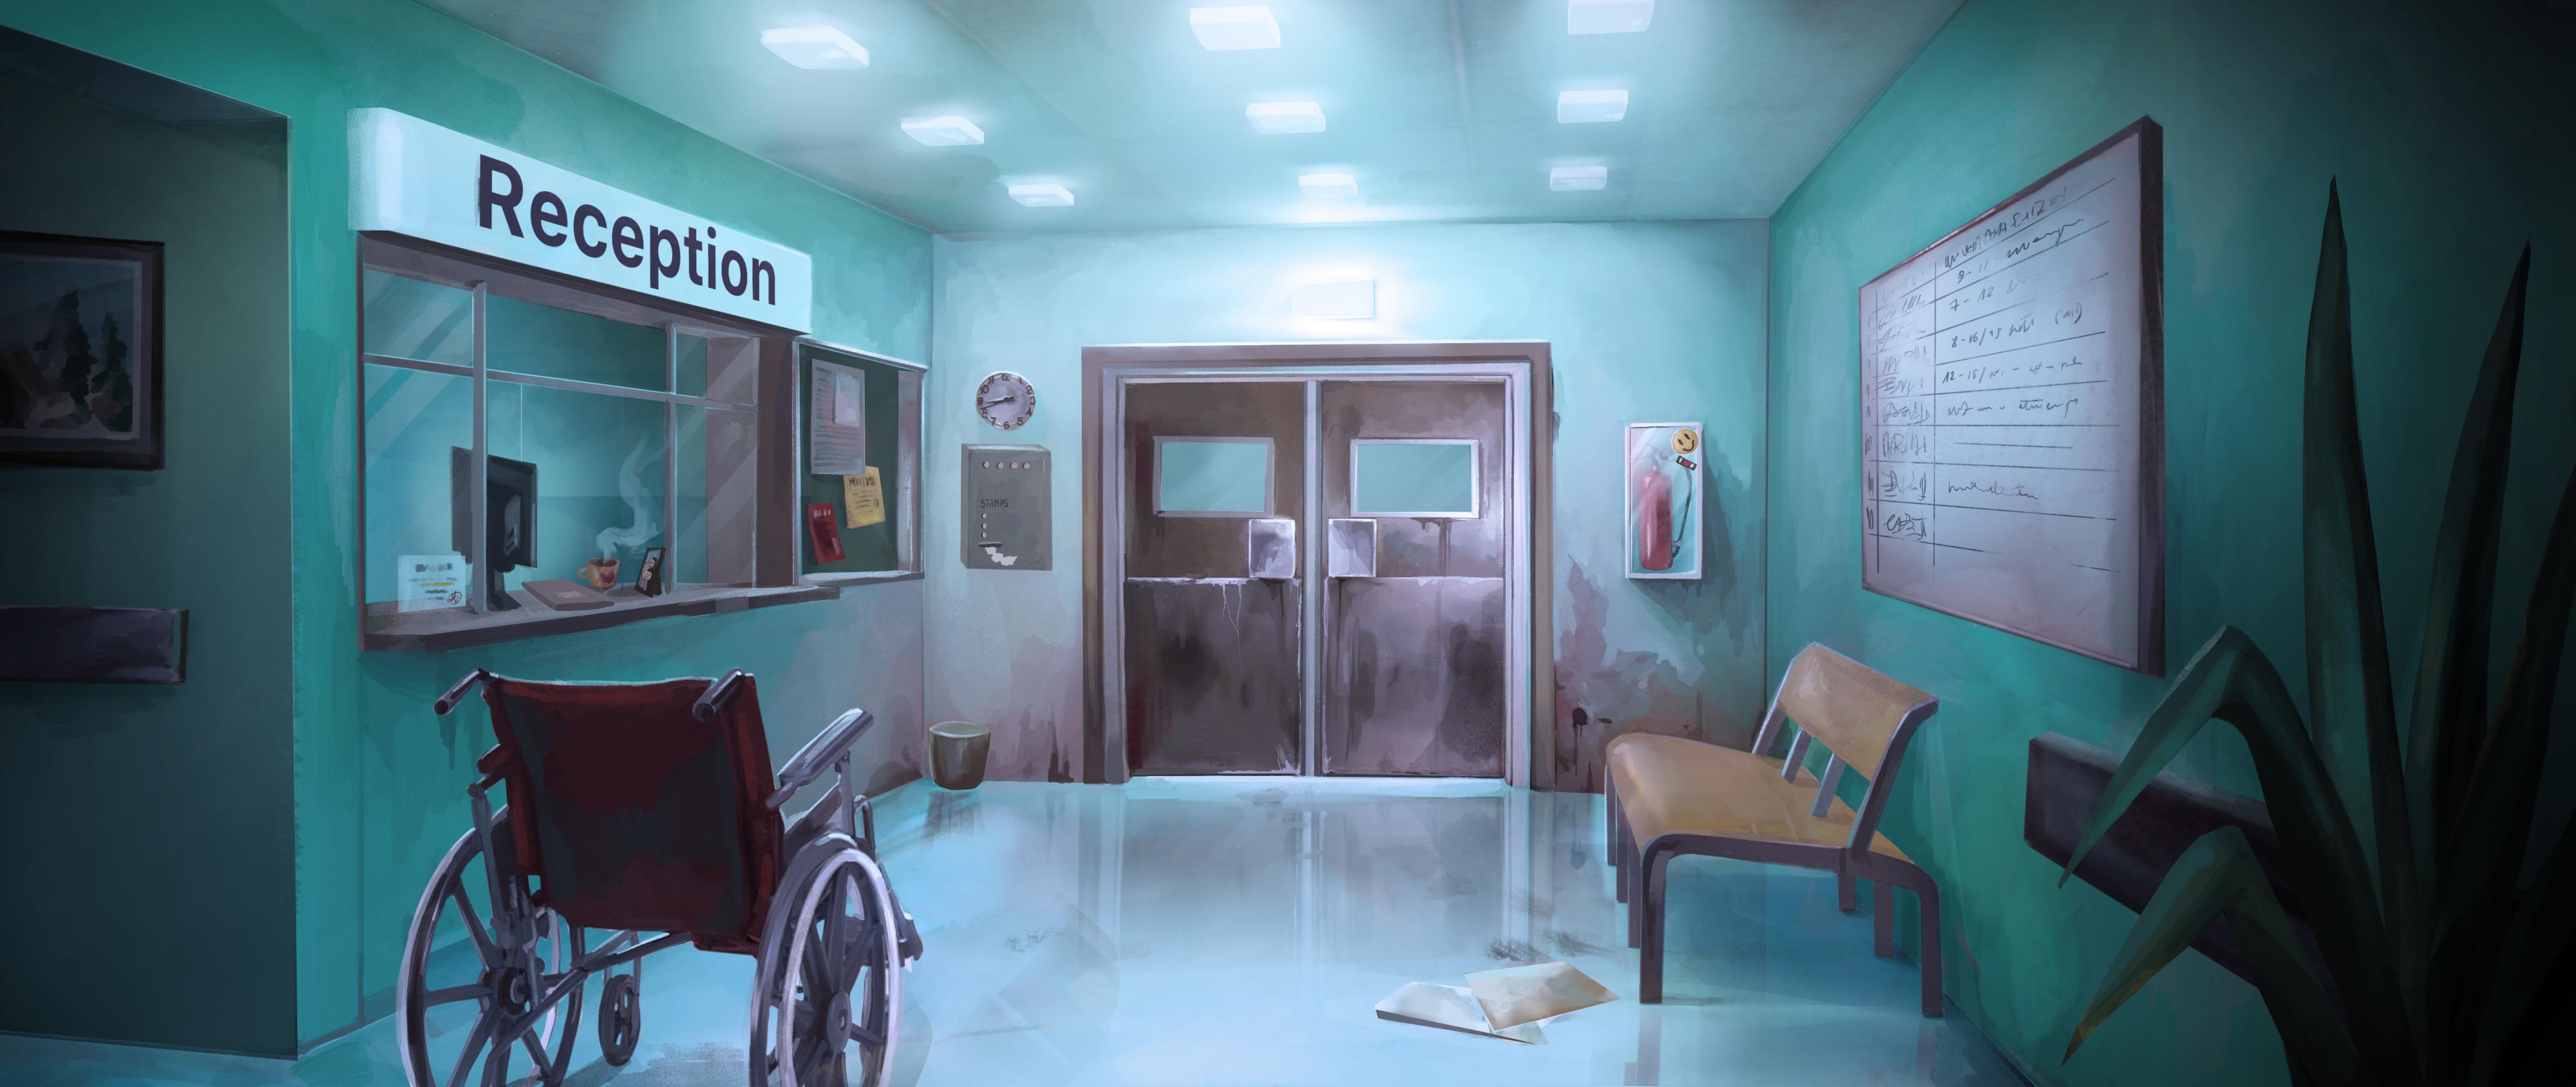 ep 2 lokacja hospital reception